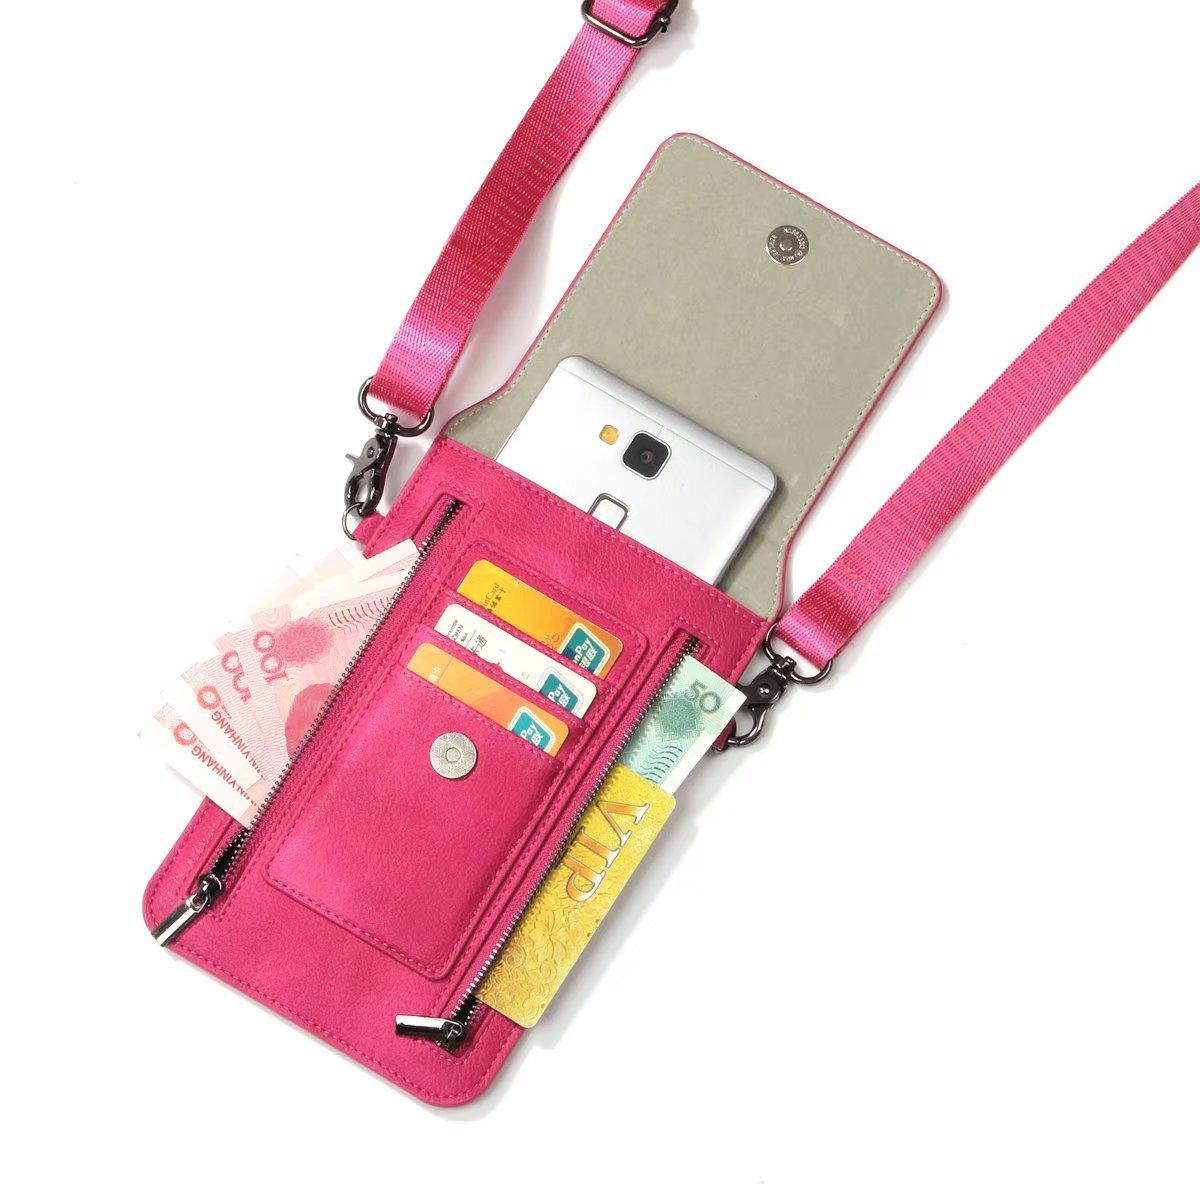 a283ad44c9b0 Amazon.com: SelliPhone Women Girls Outdoor Zipper PU Leather ...